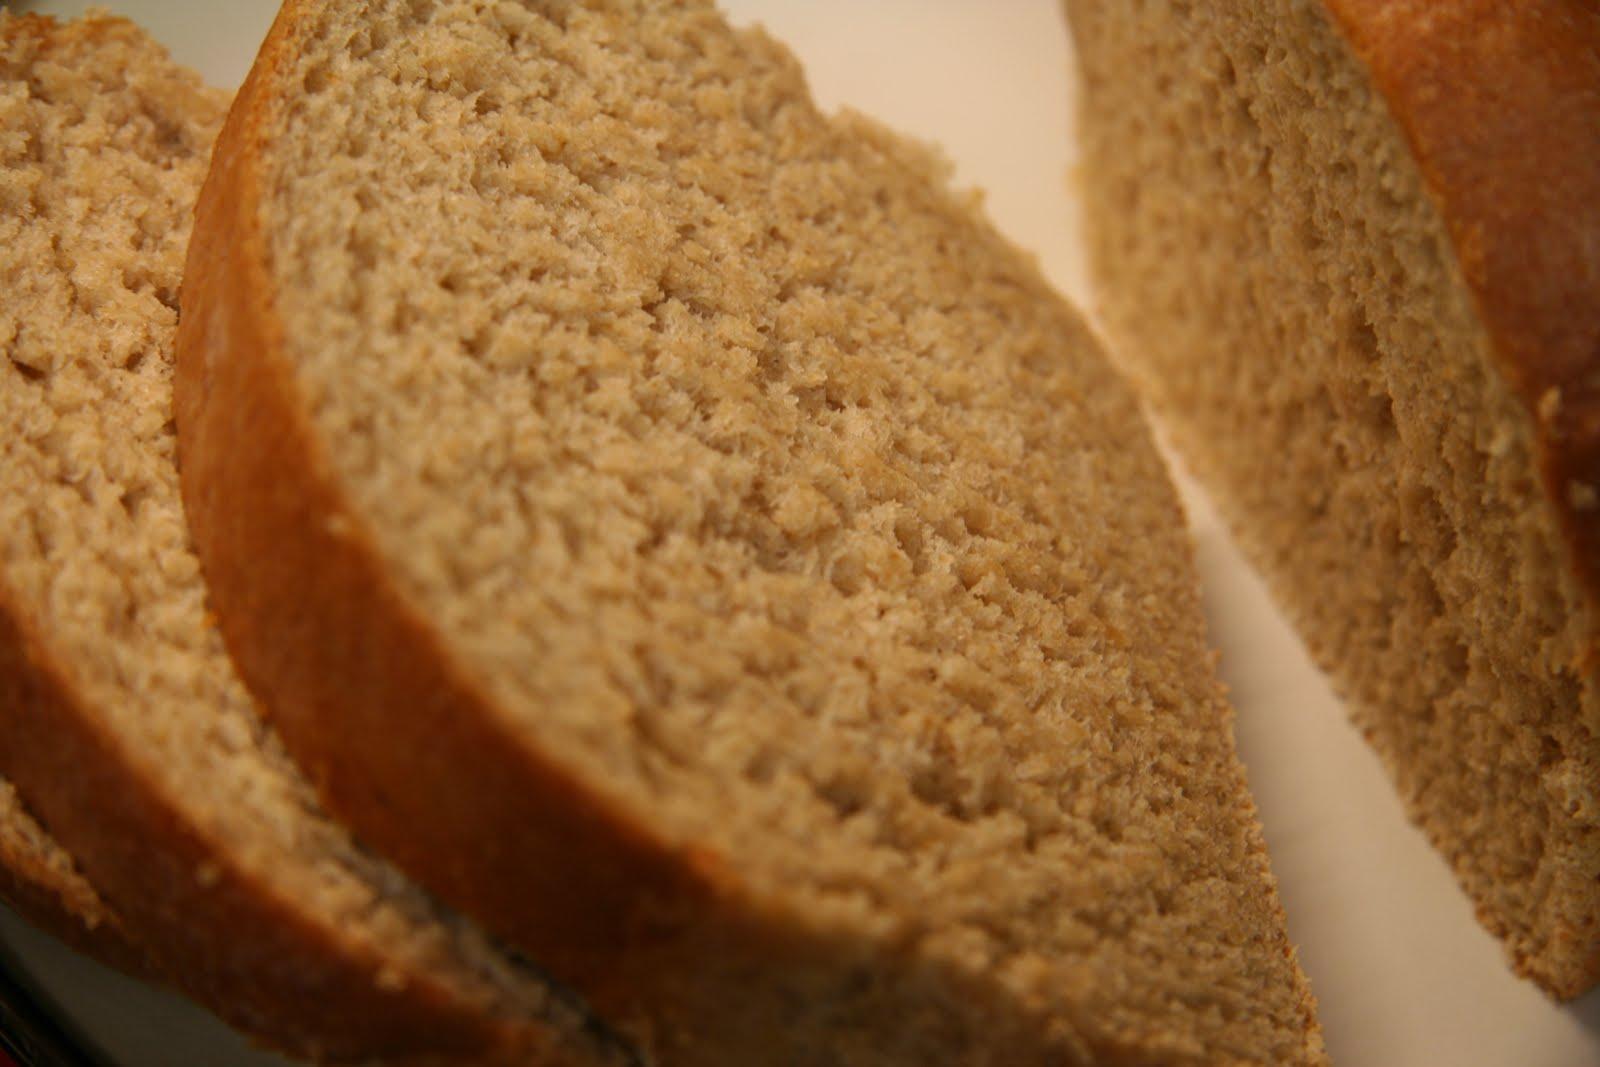 Kneady Sweetie: Yummy Whole Wheat Bread